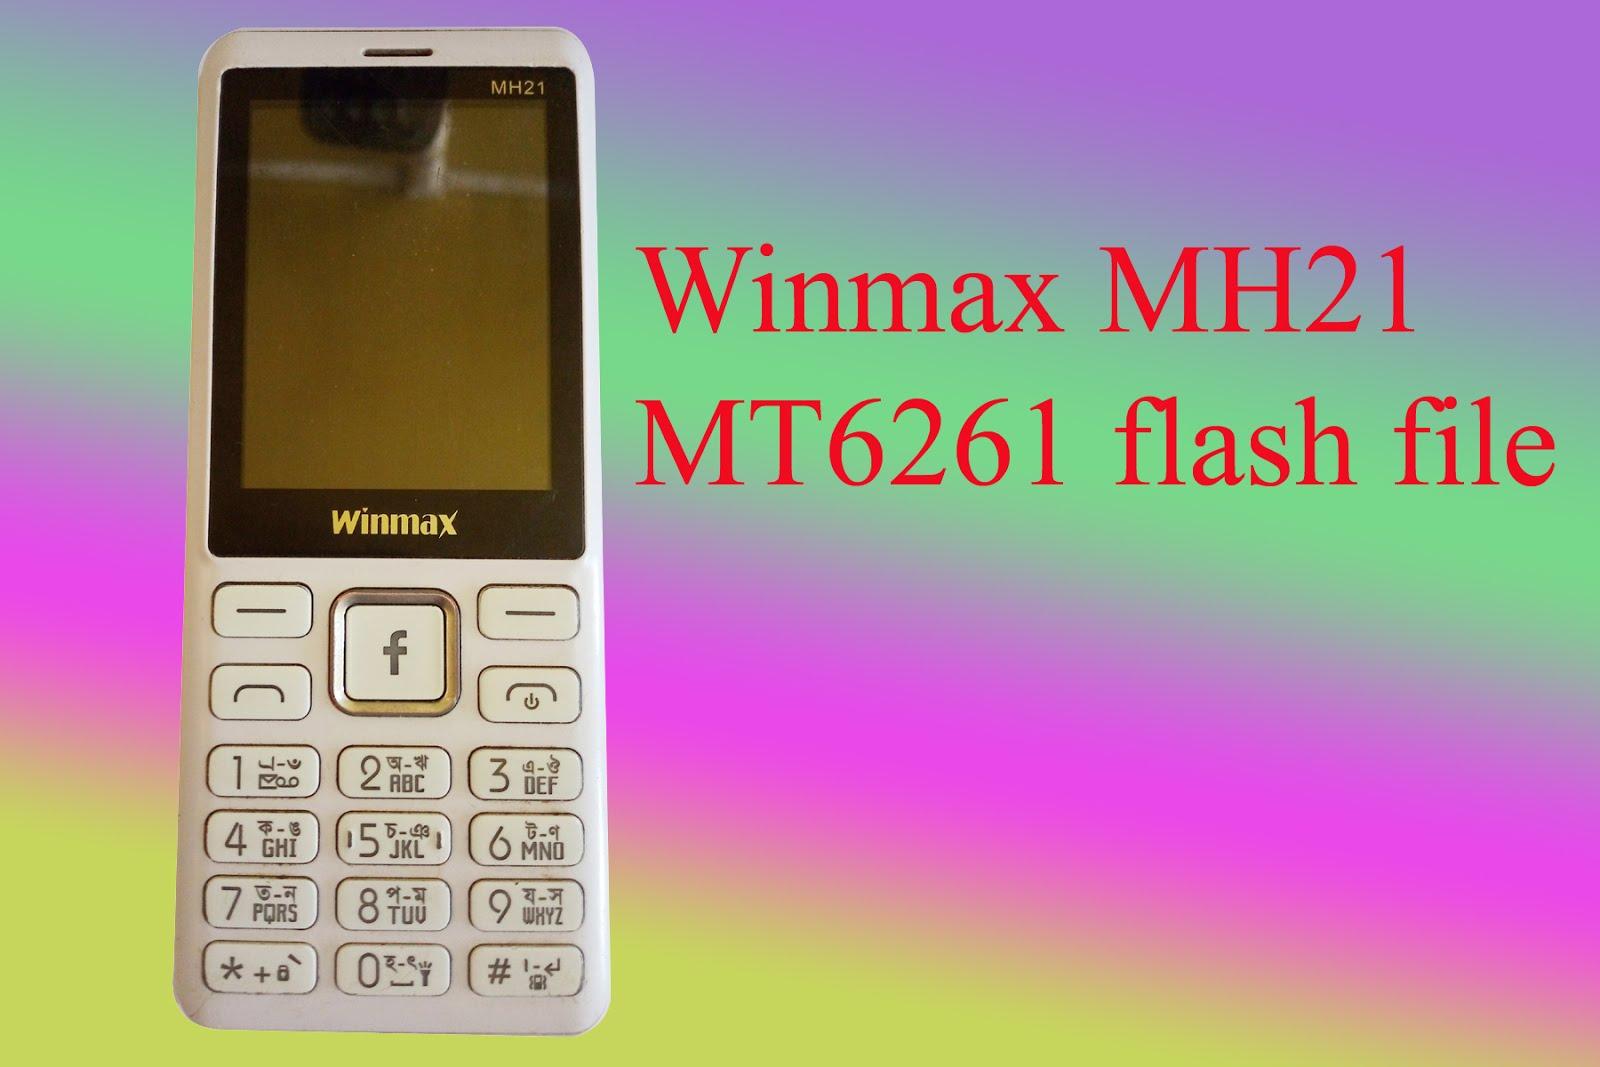 Winmax MH21 firmware